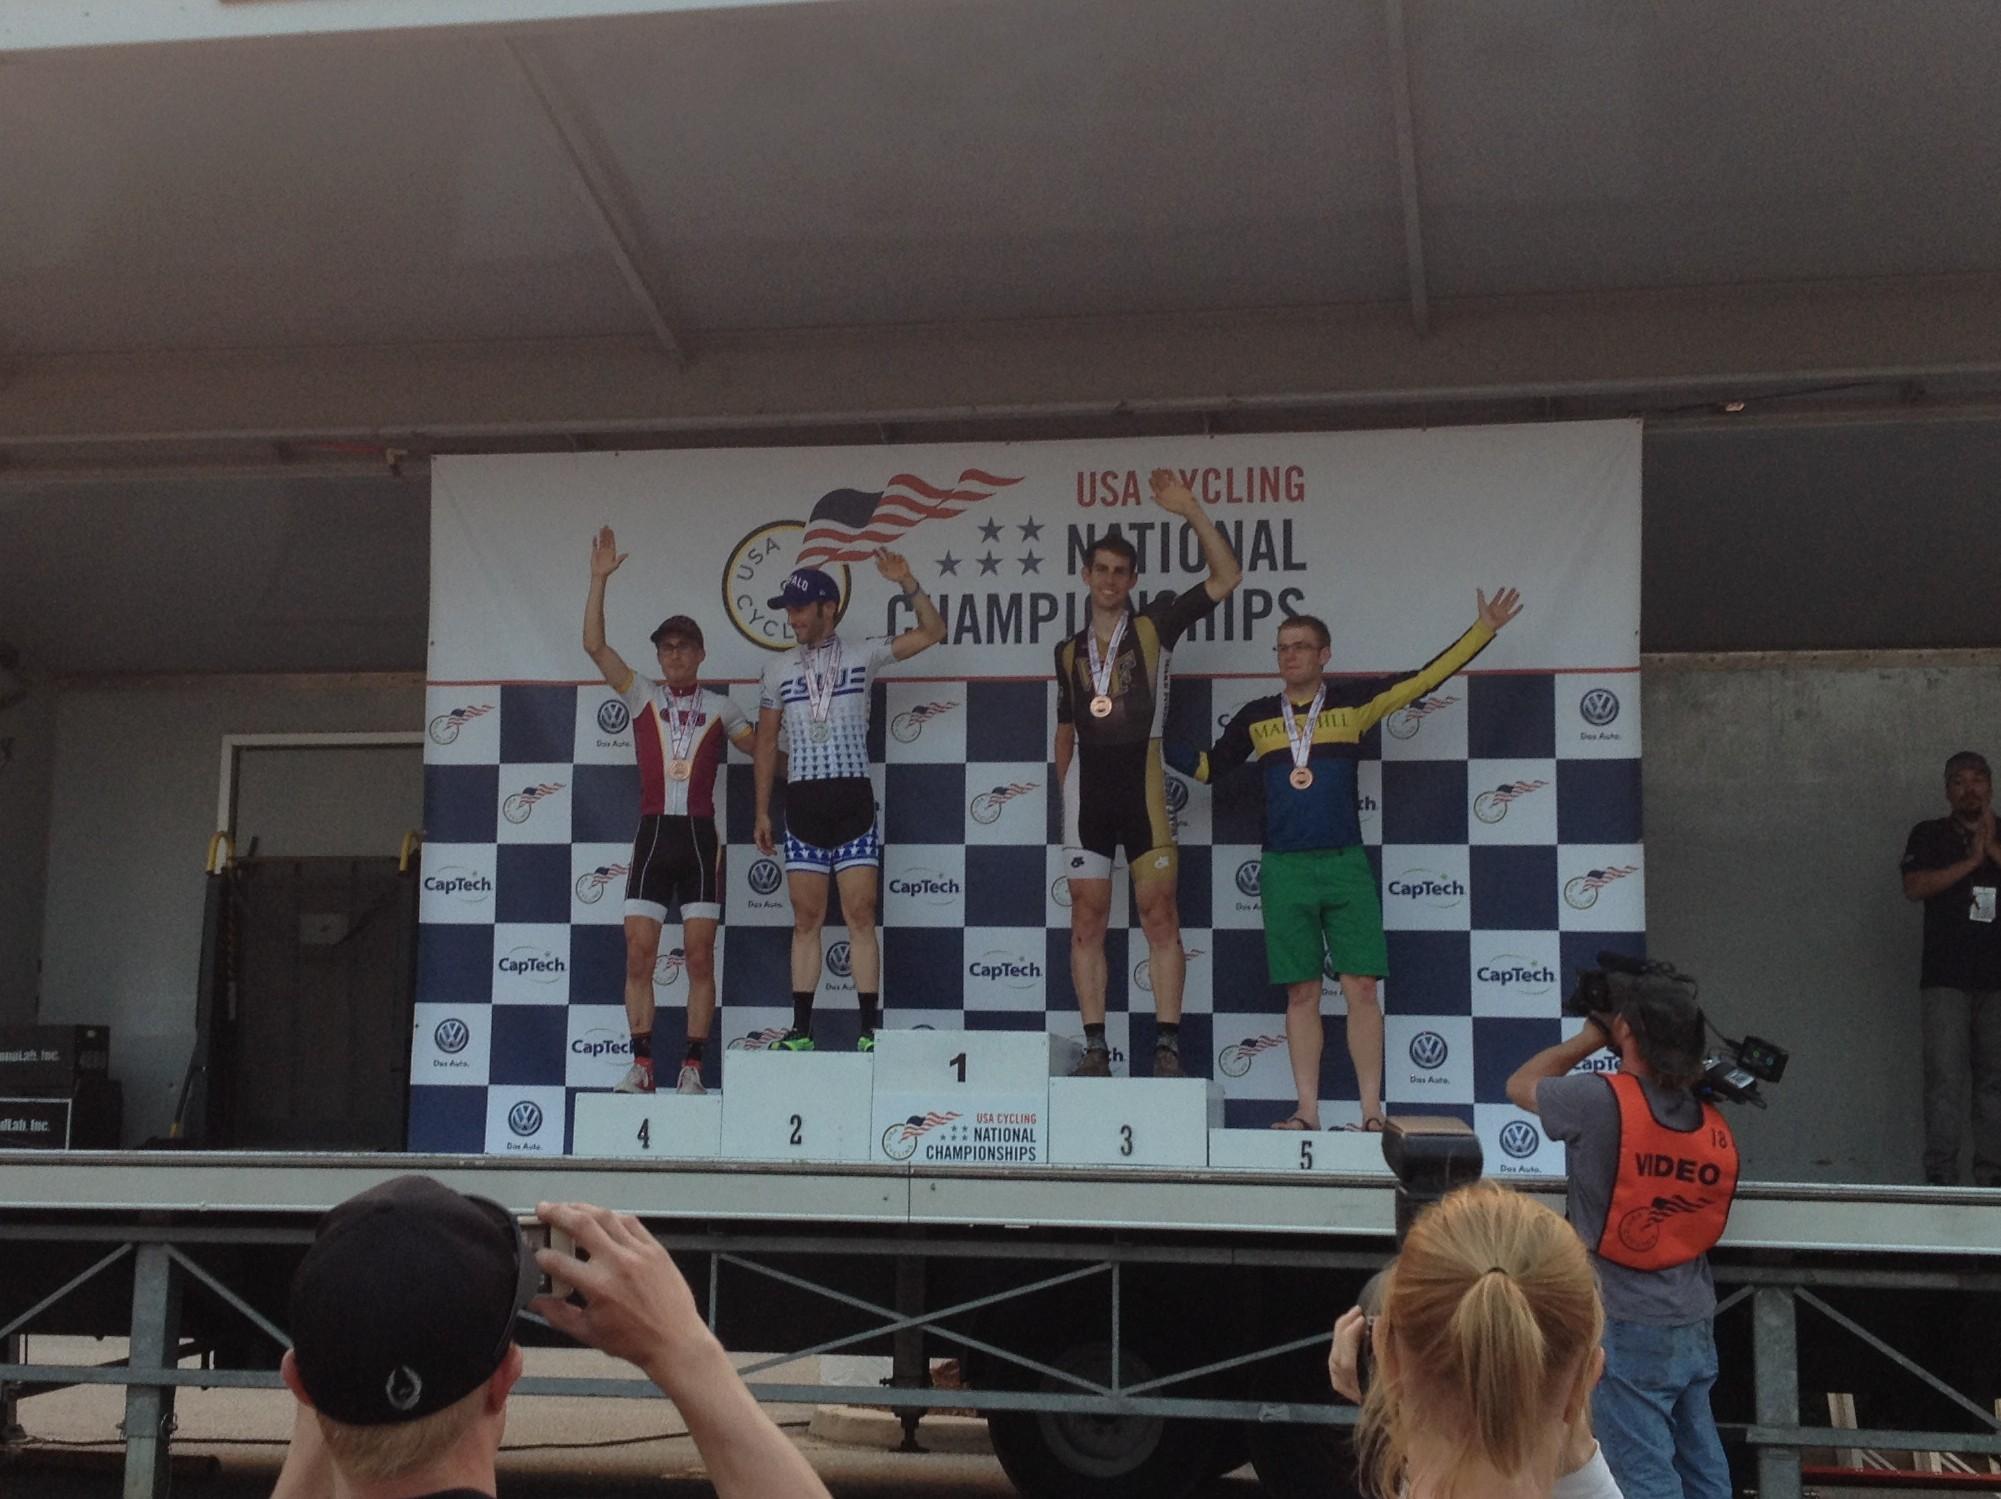 Steven Vogel, Wake Forest Univ, at the 2014 National Championships